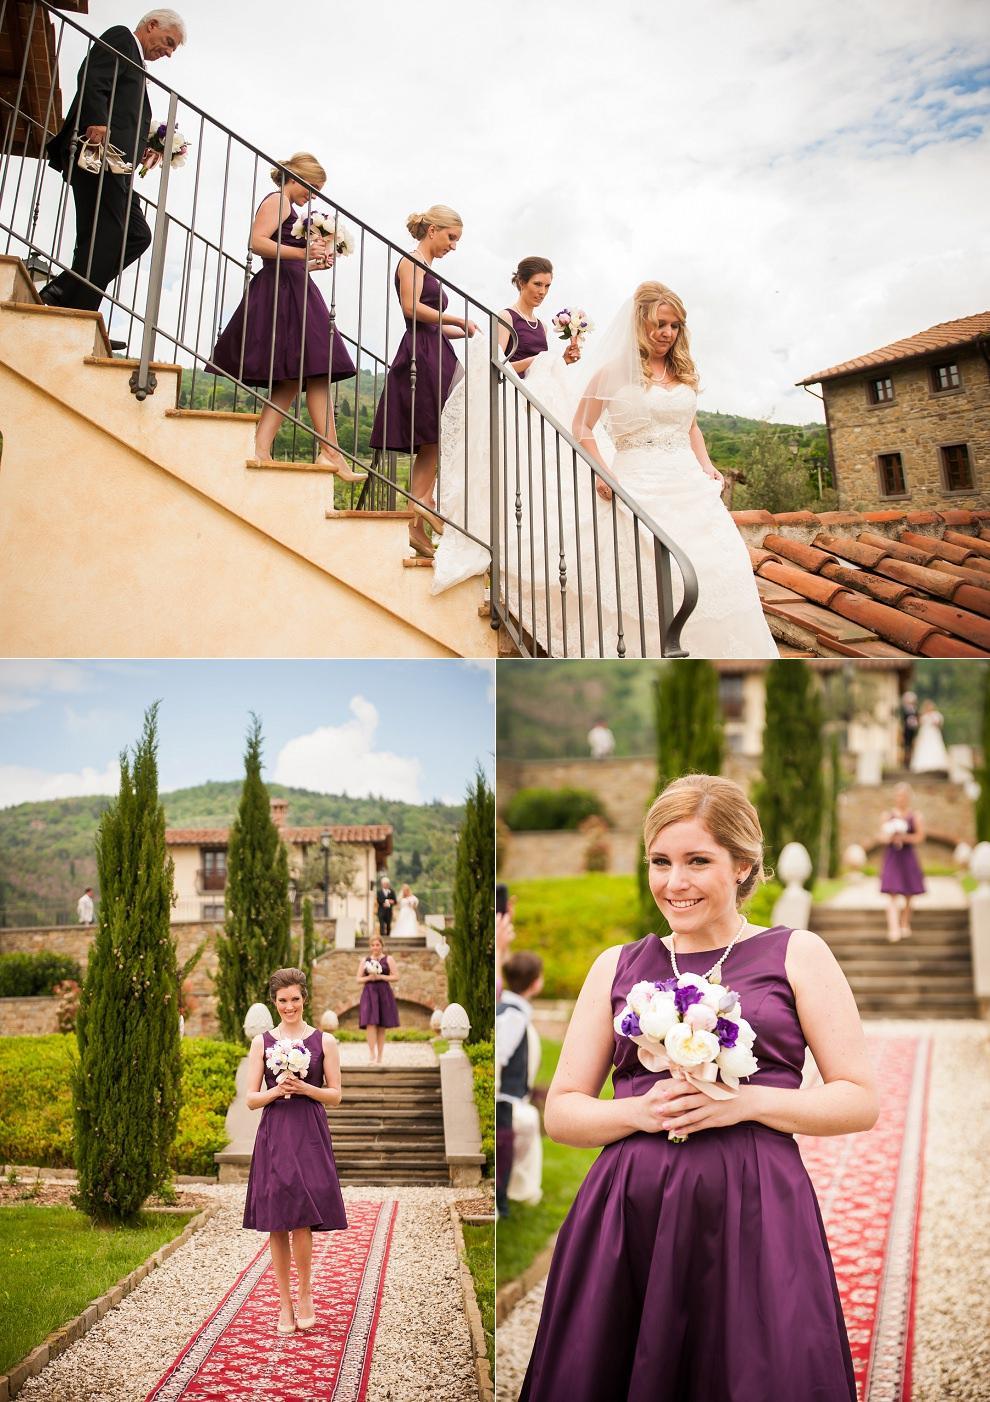 Italy-Tuscany-wedding-Villa-Baroncino-18